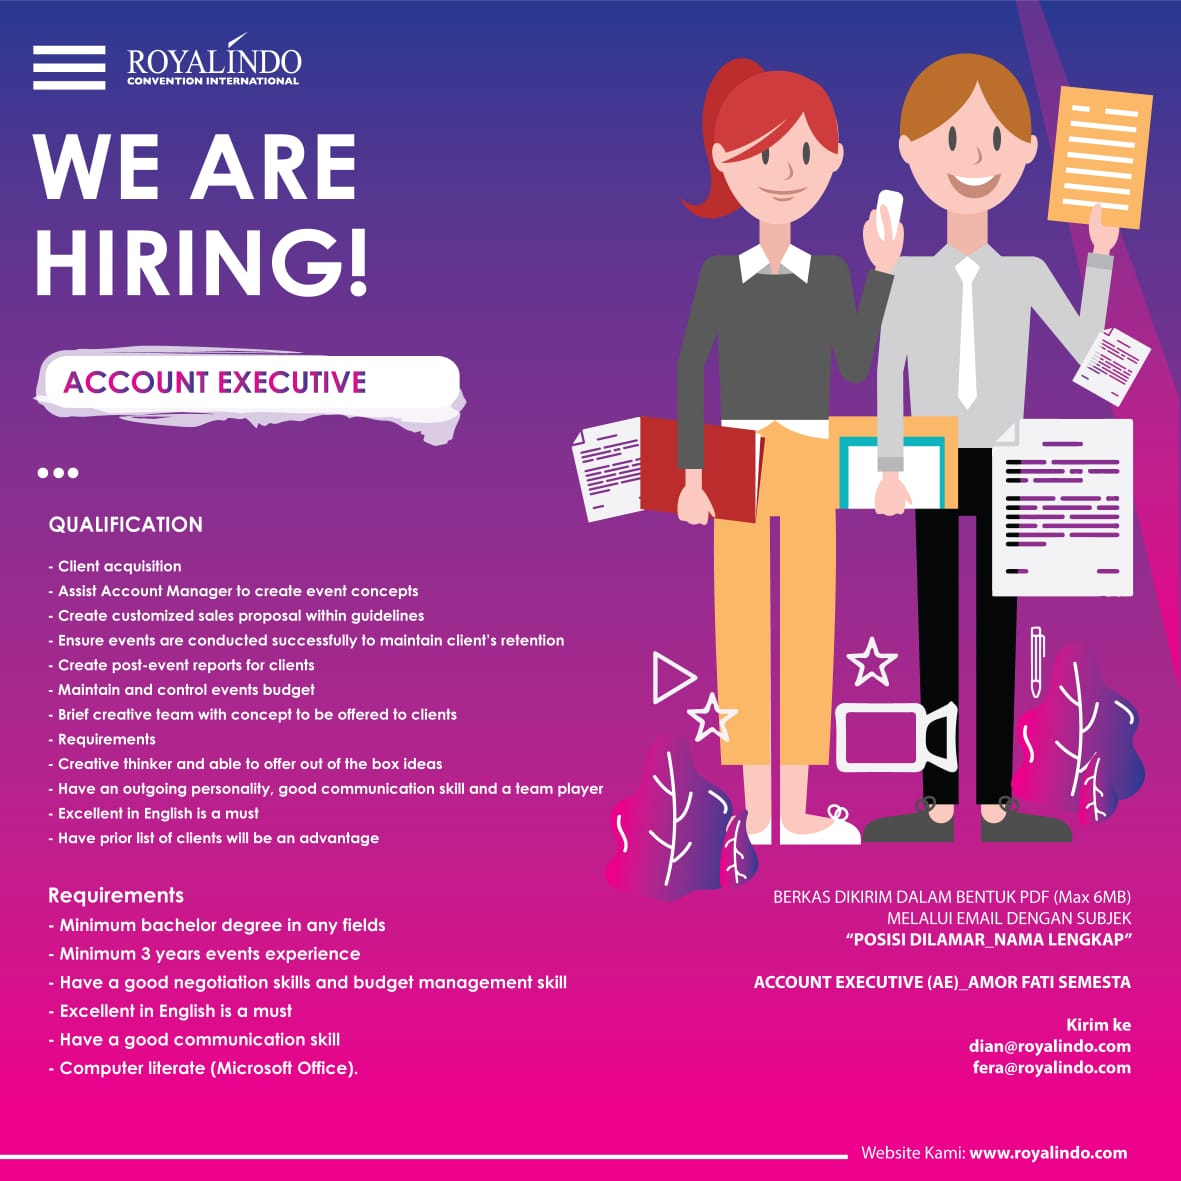 Royalindo Jobs AE